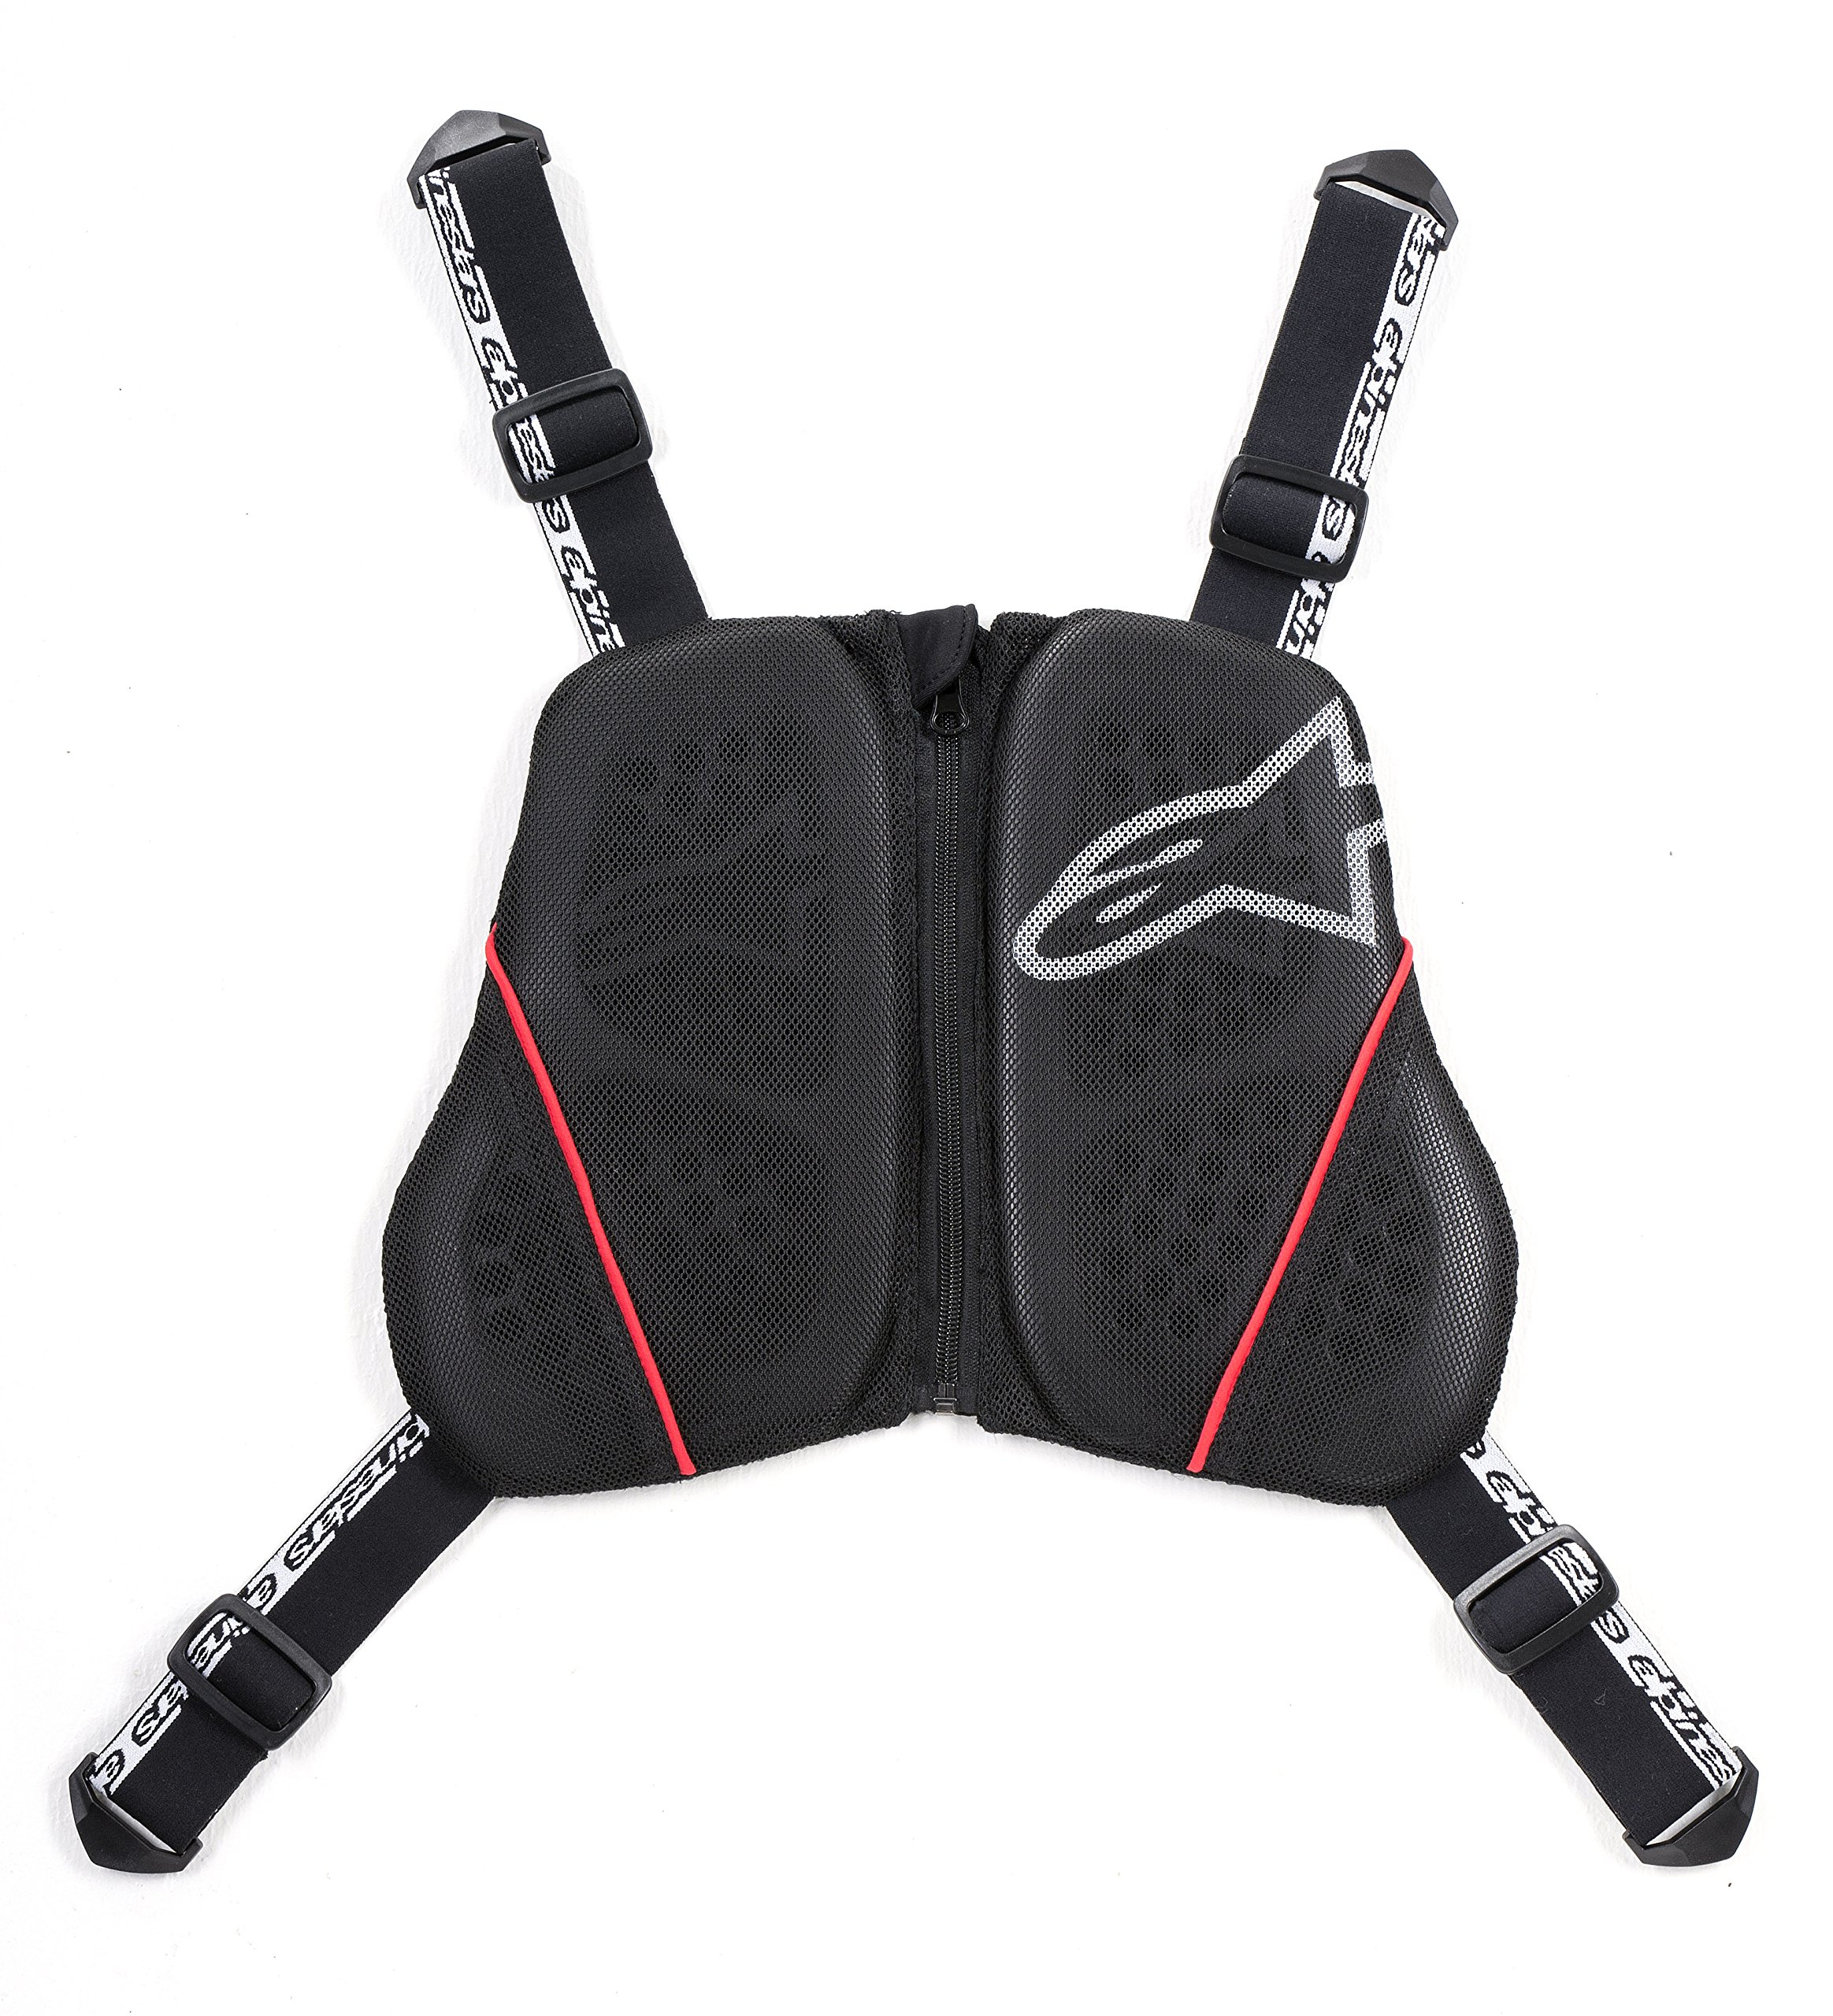 Alpinestars Nucleon KR-C Chest Harness (BLACK/WHITE/RED)